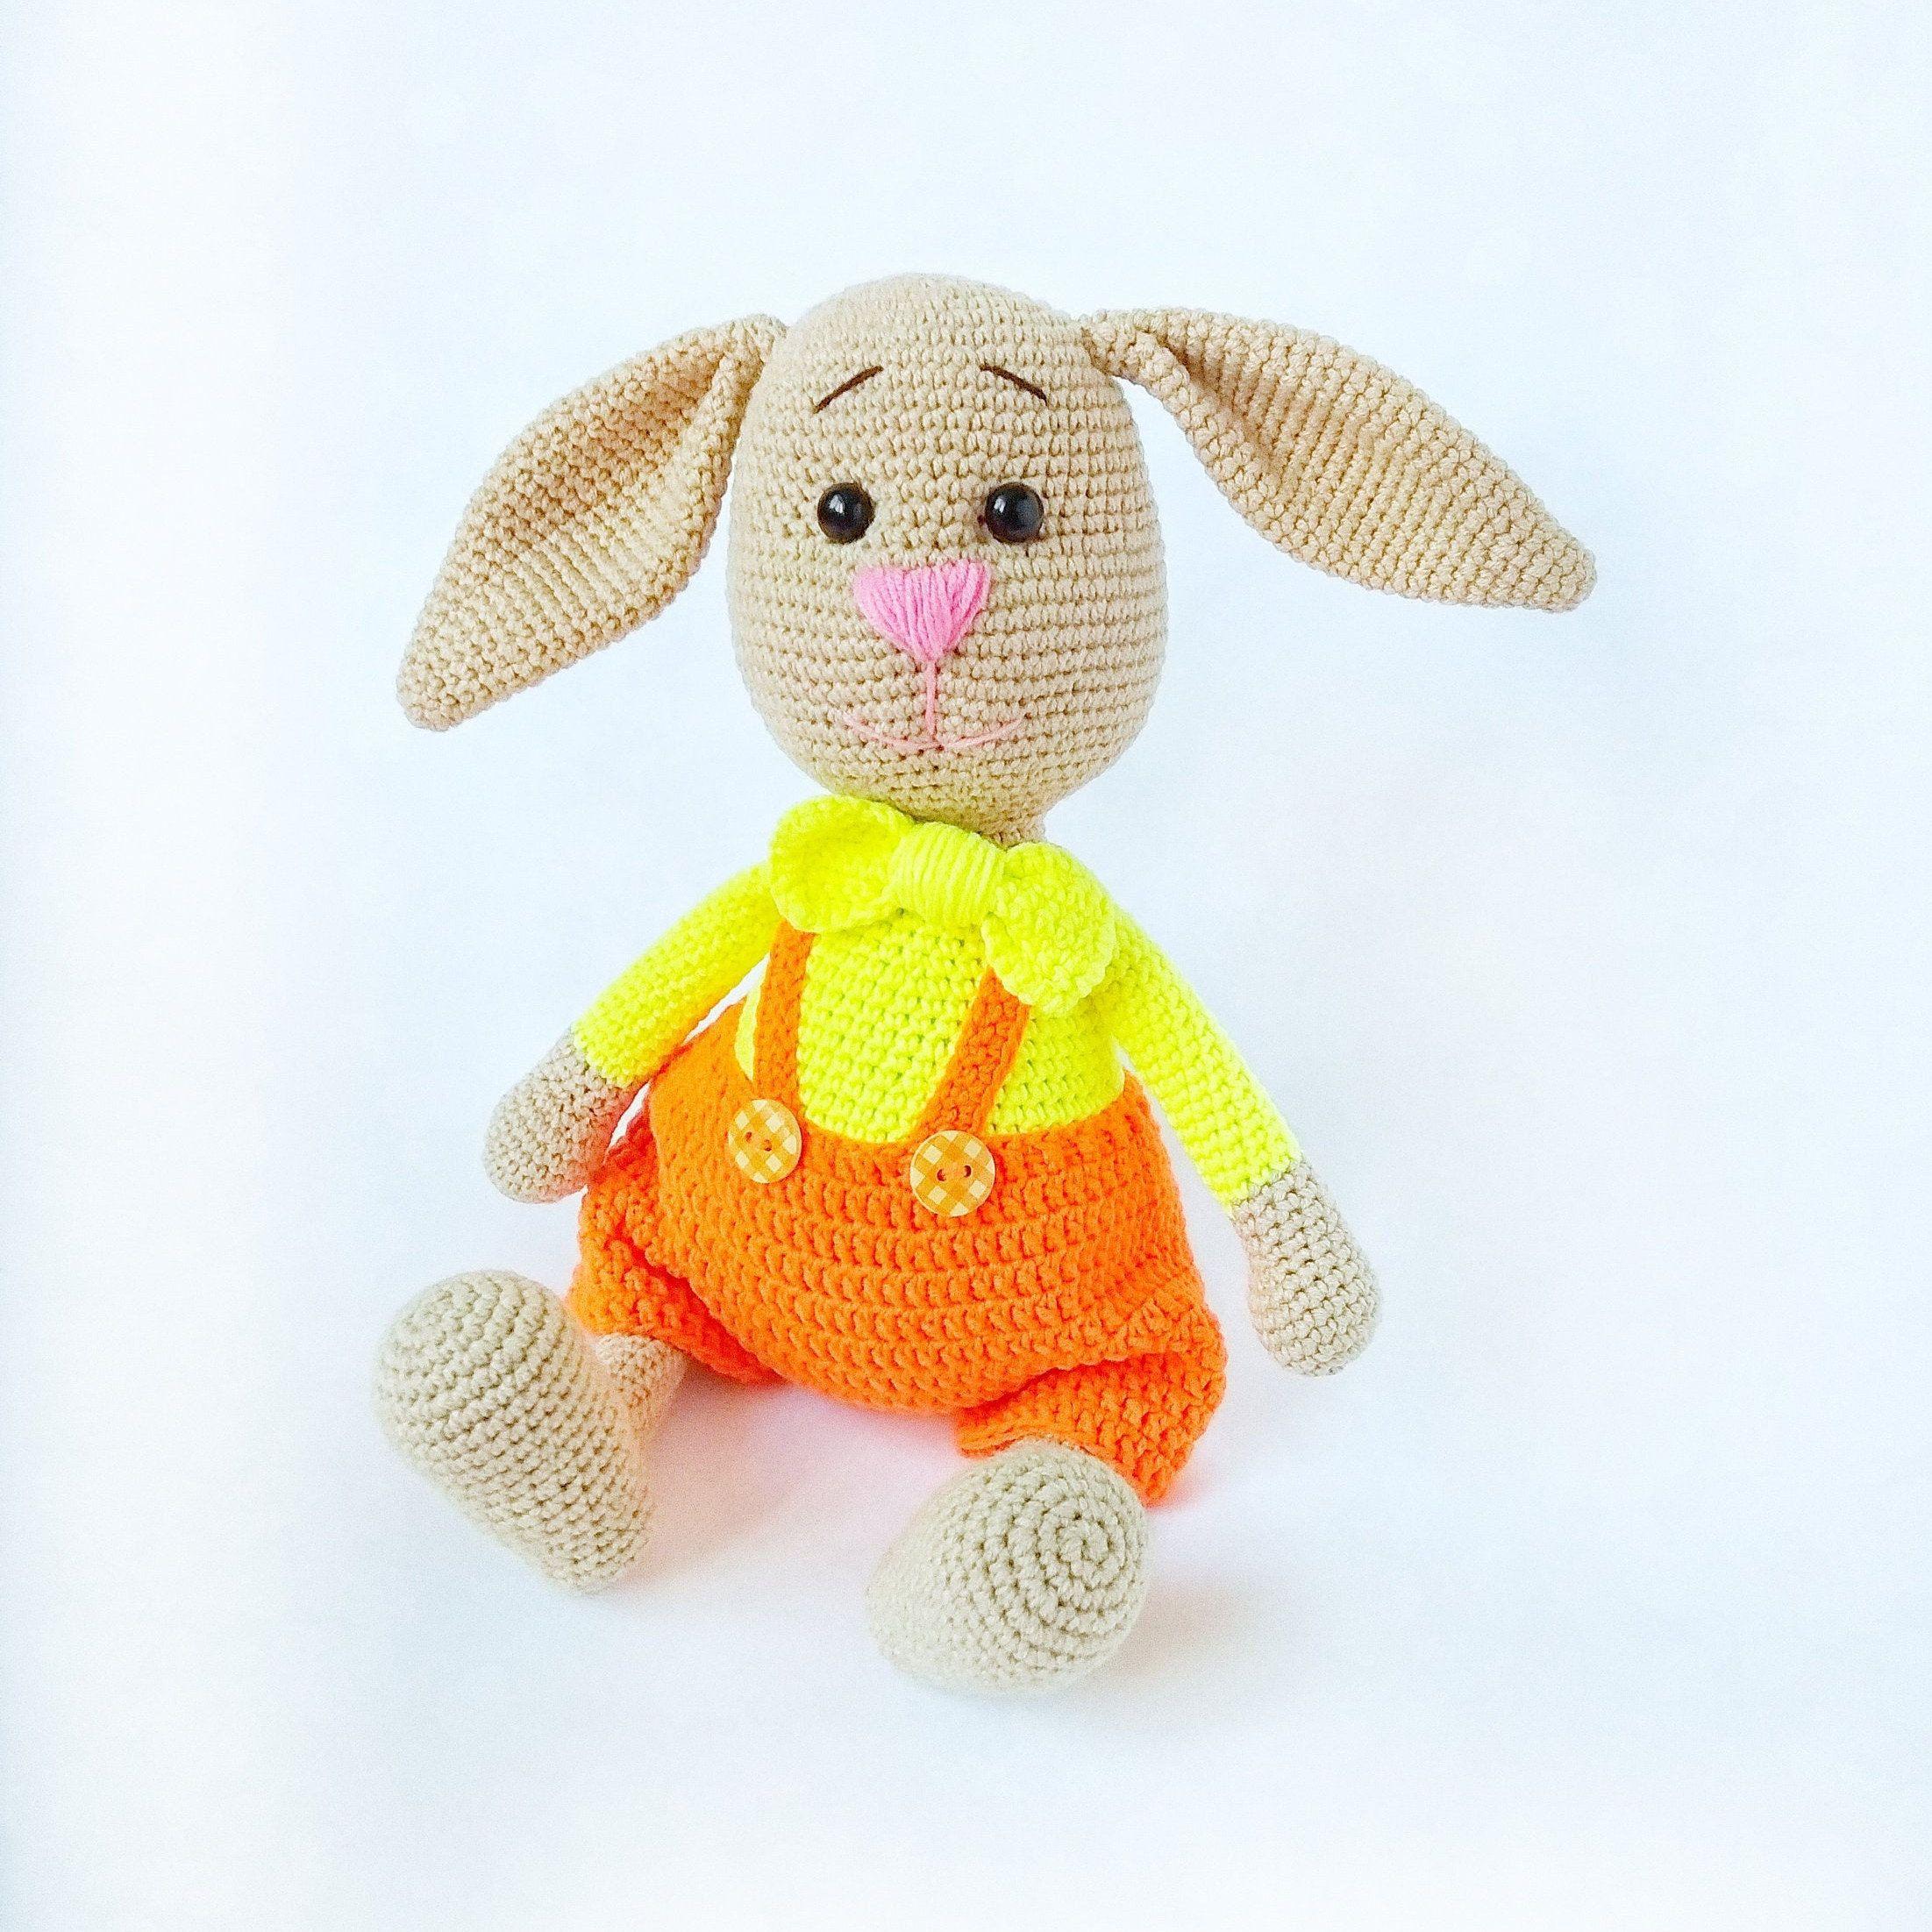 Cute Bunny Crochet bunny Crochet animals Toy amigurumi Handmade rabbit Crochet toy Easter decor Kids toy Rabbit toy Bunny girl Stuffed bunny